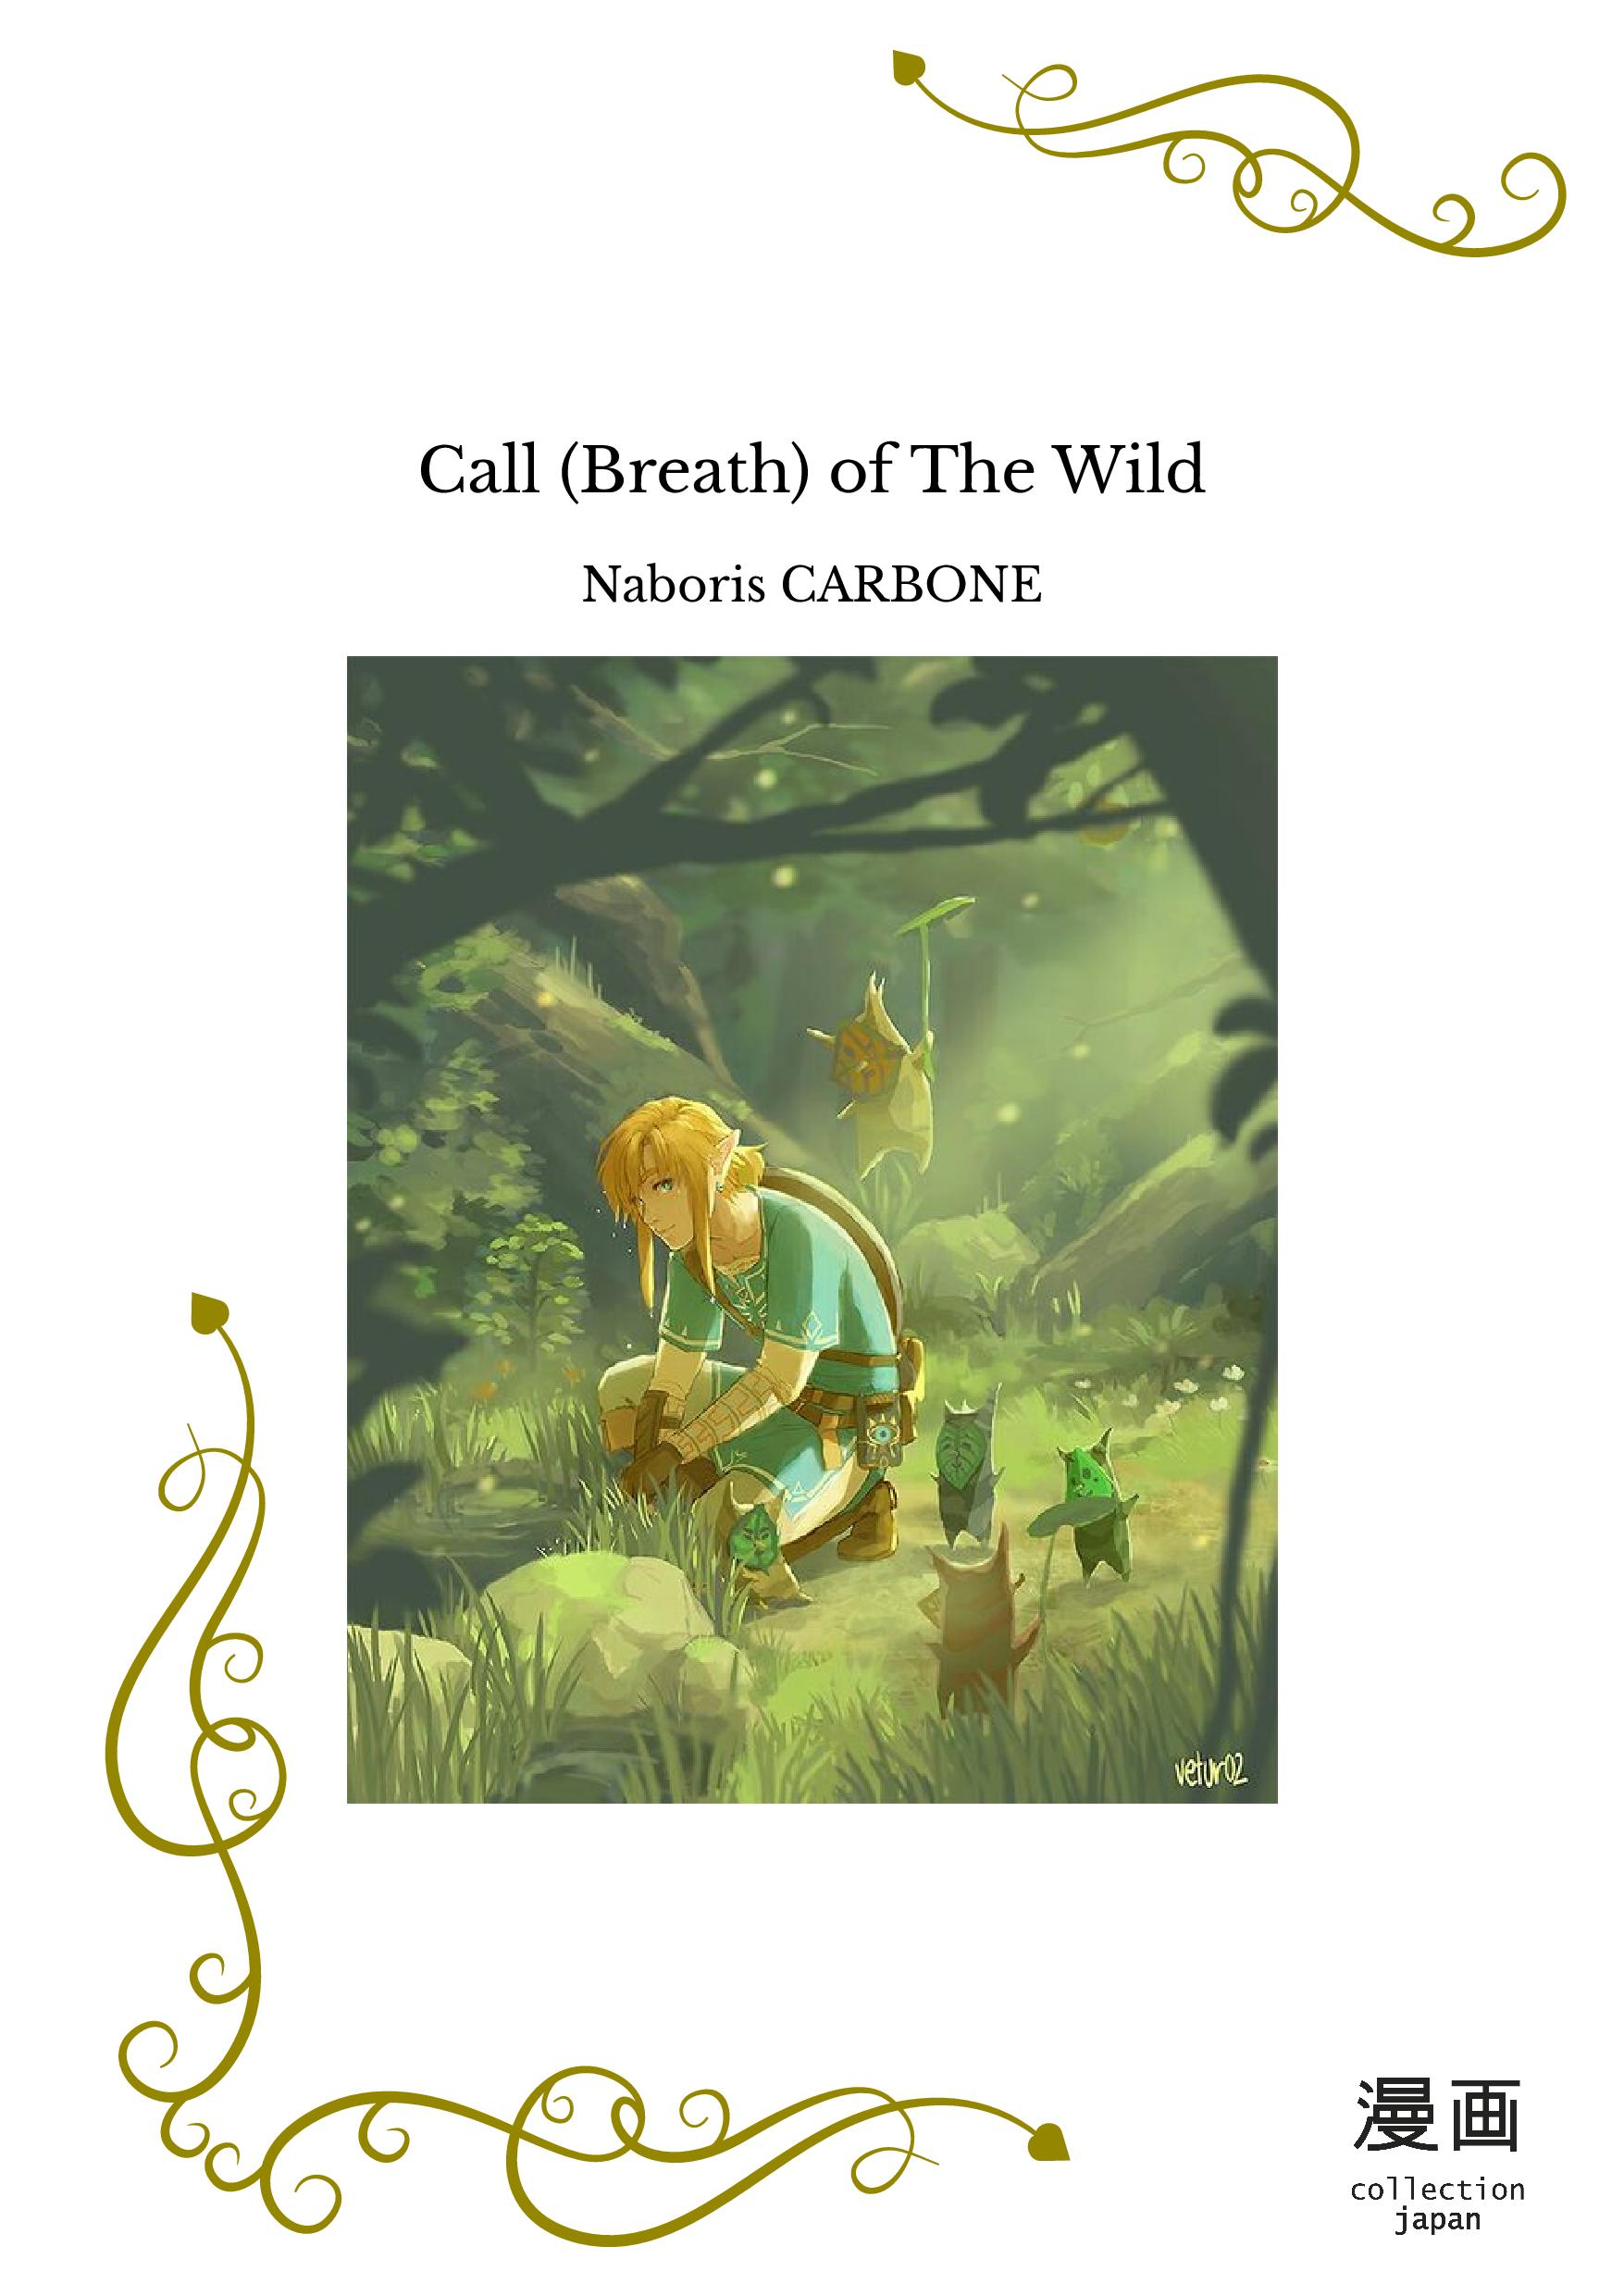 Call (Breath) of The Wild